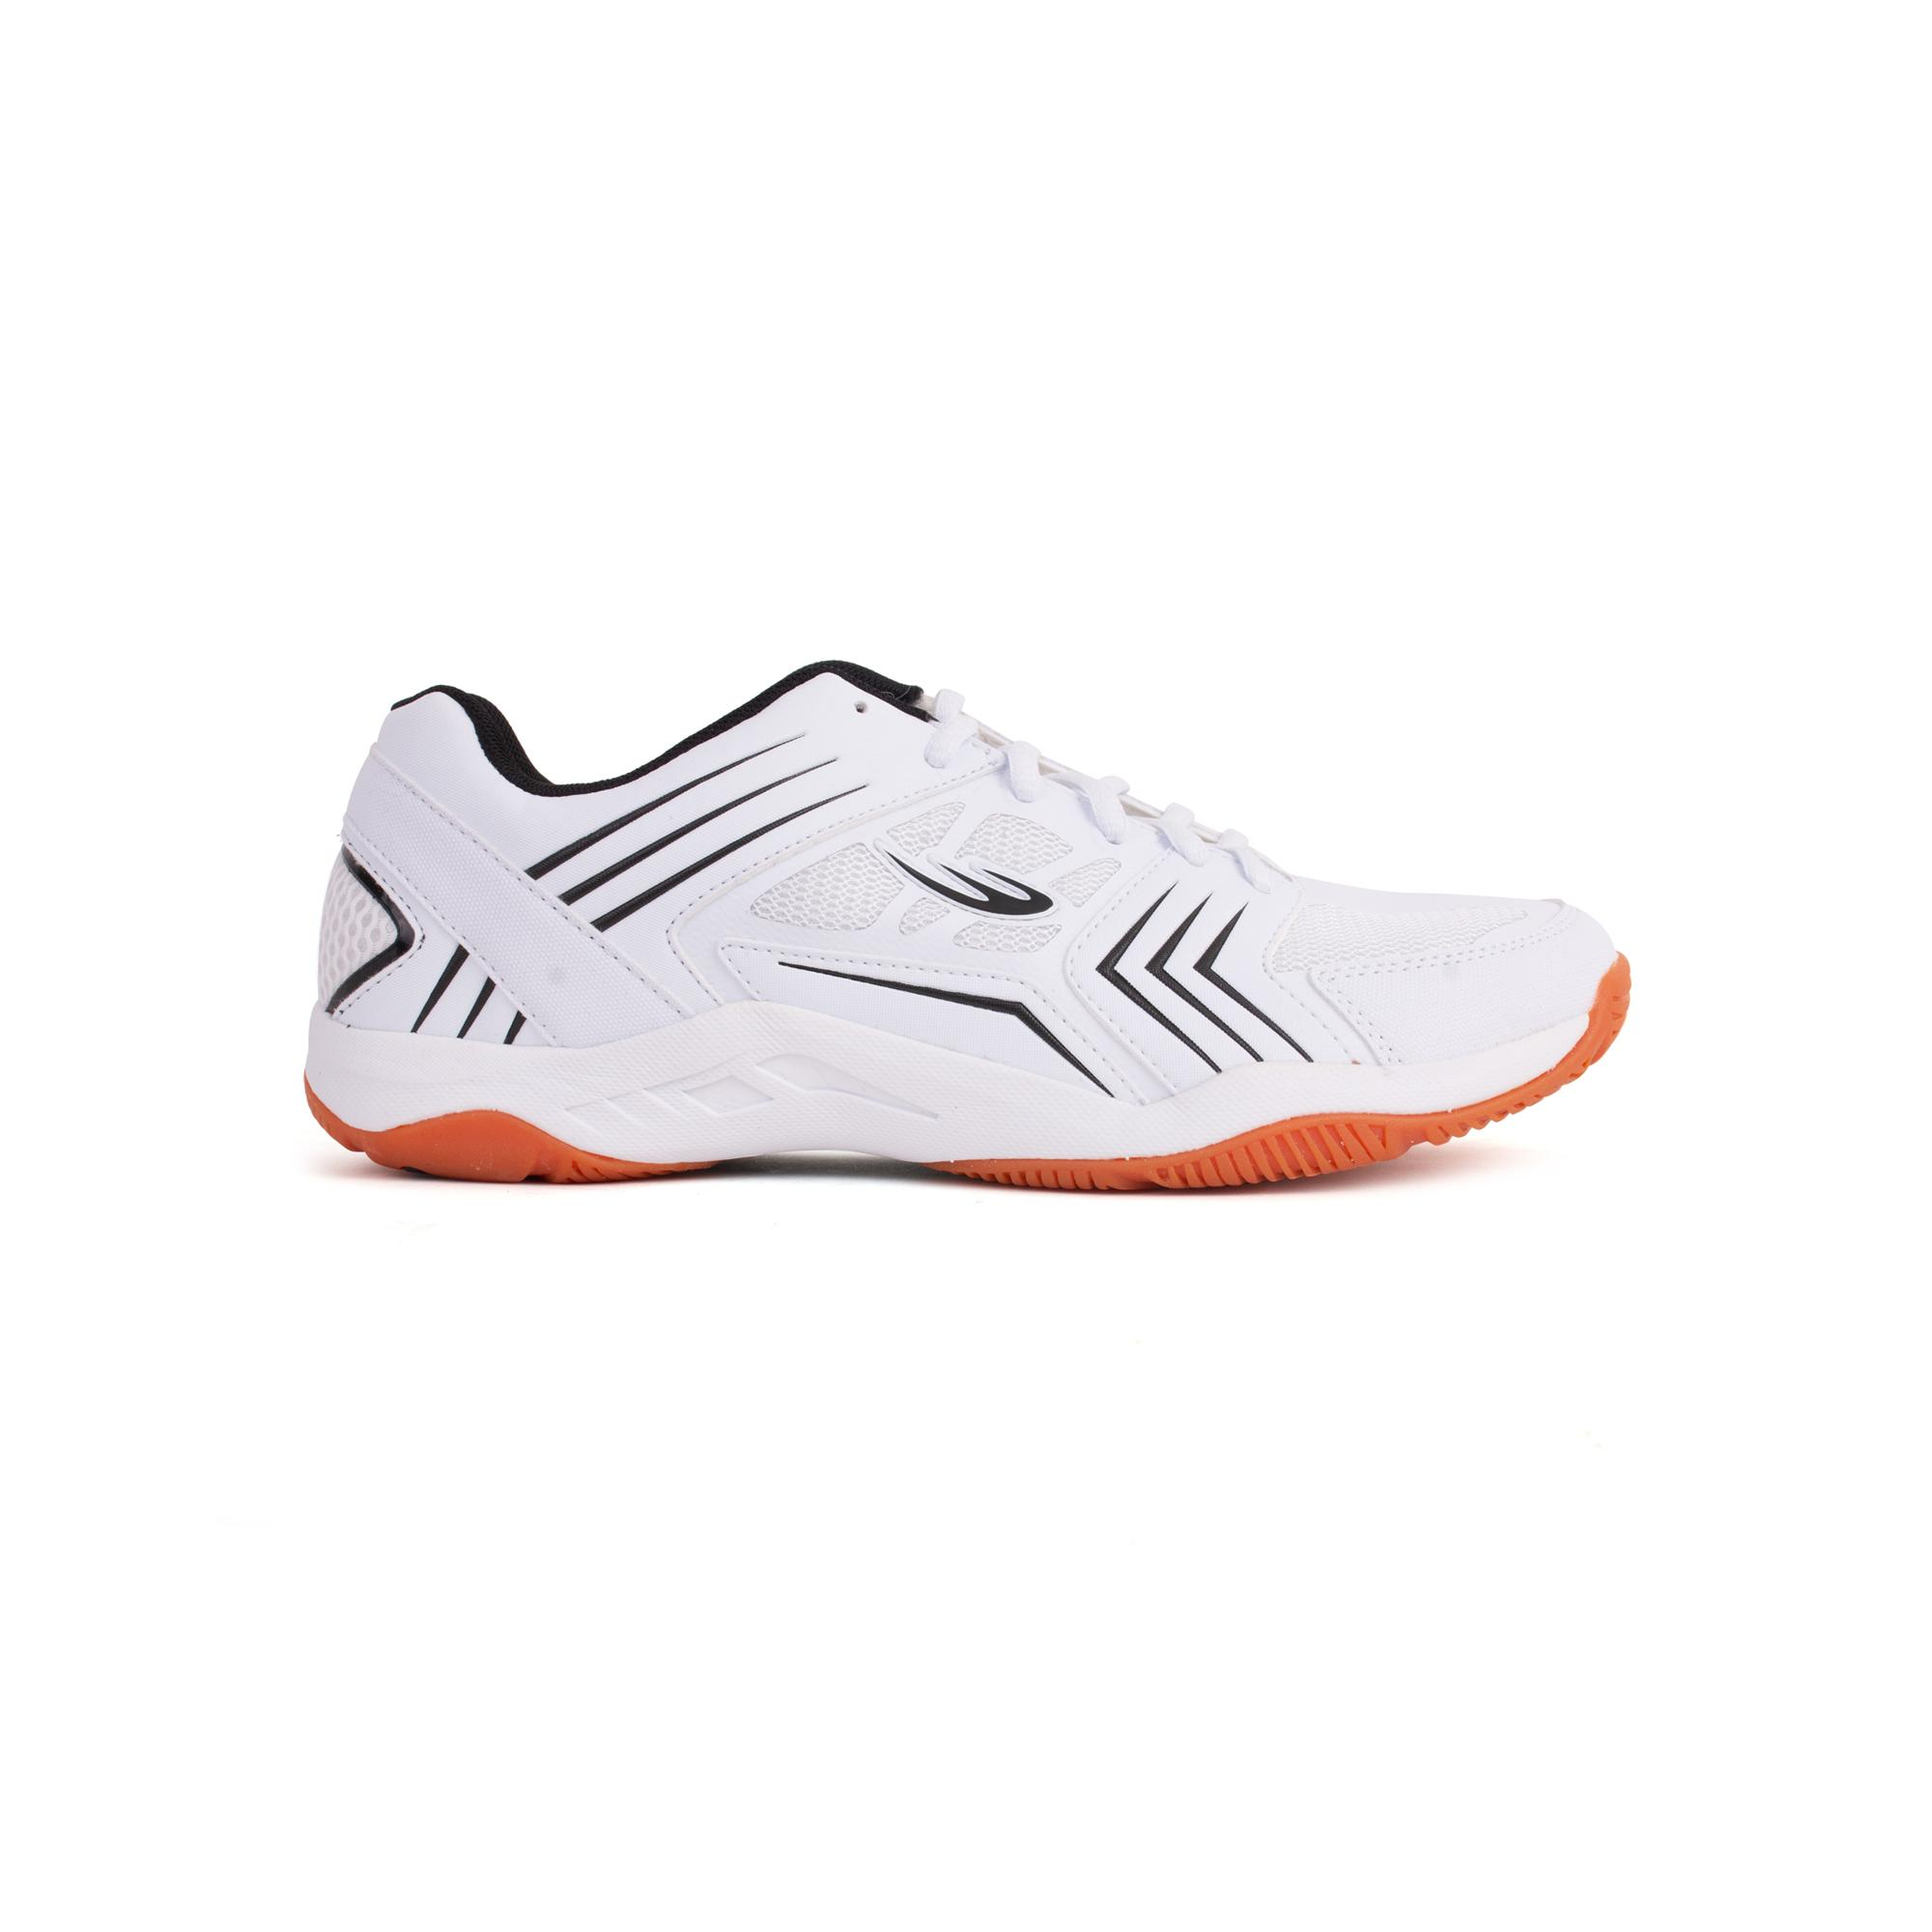 World Balance Badminton Shoes Online